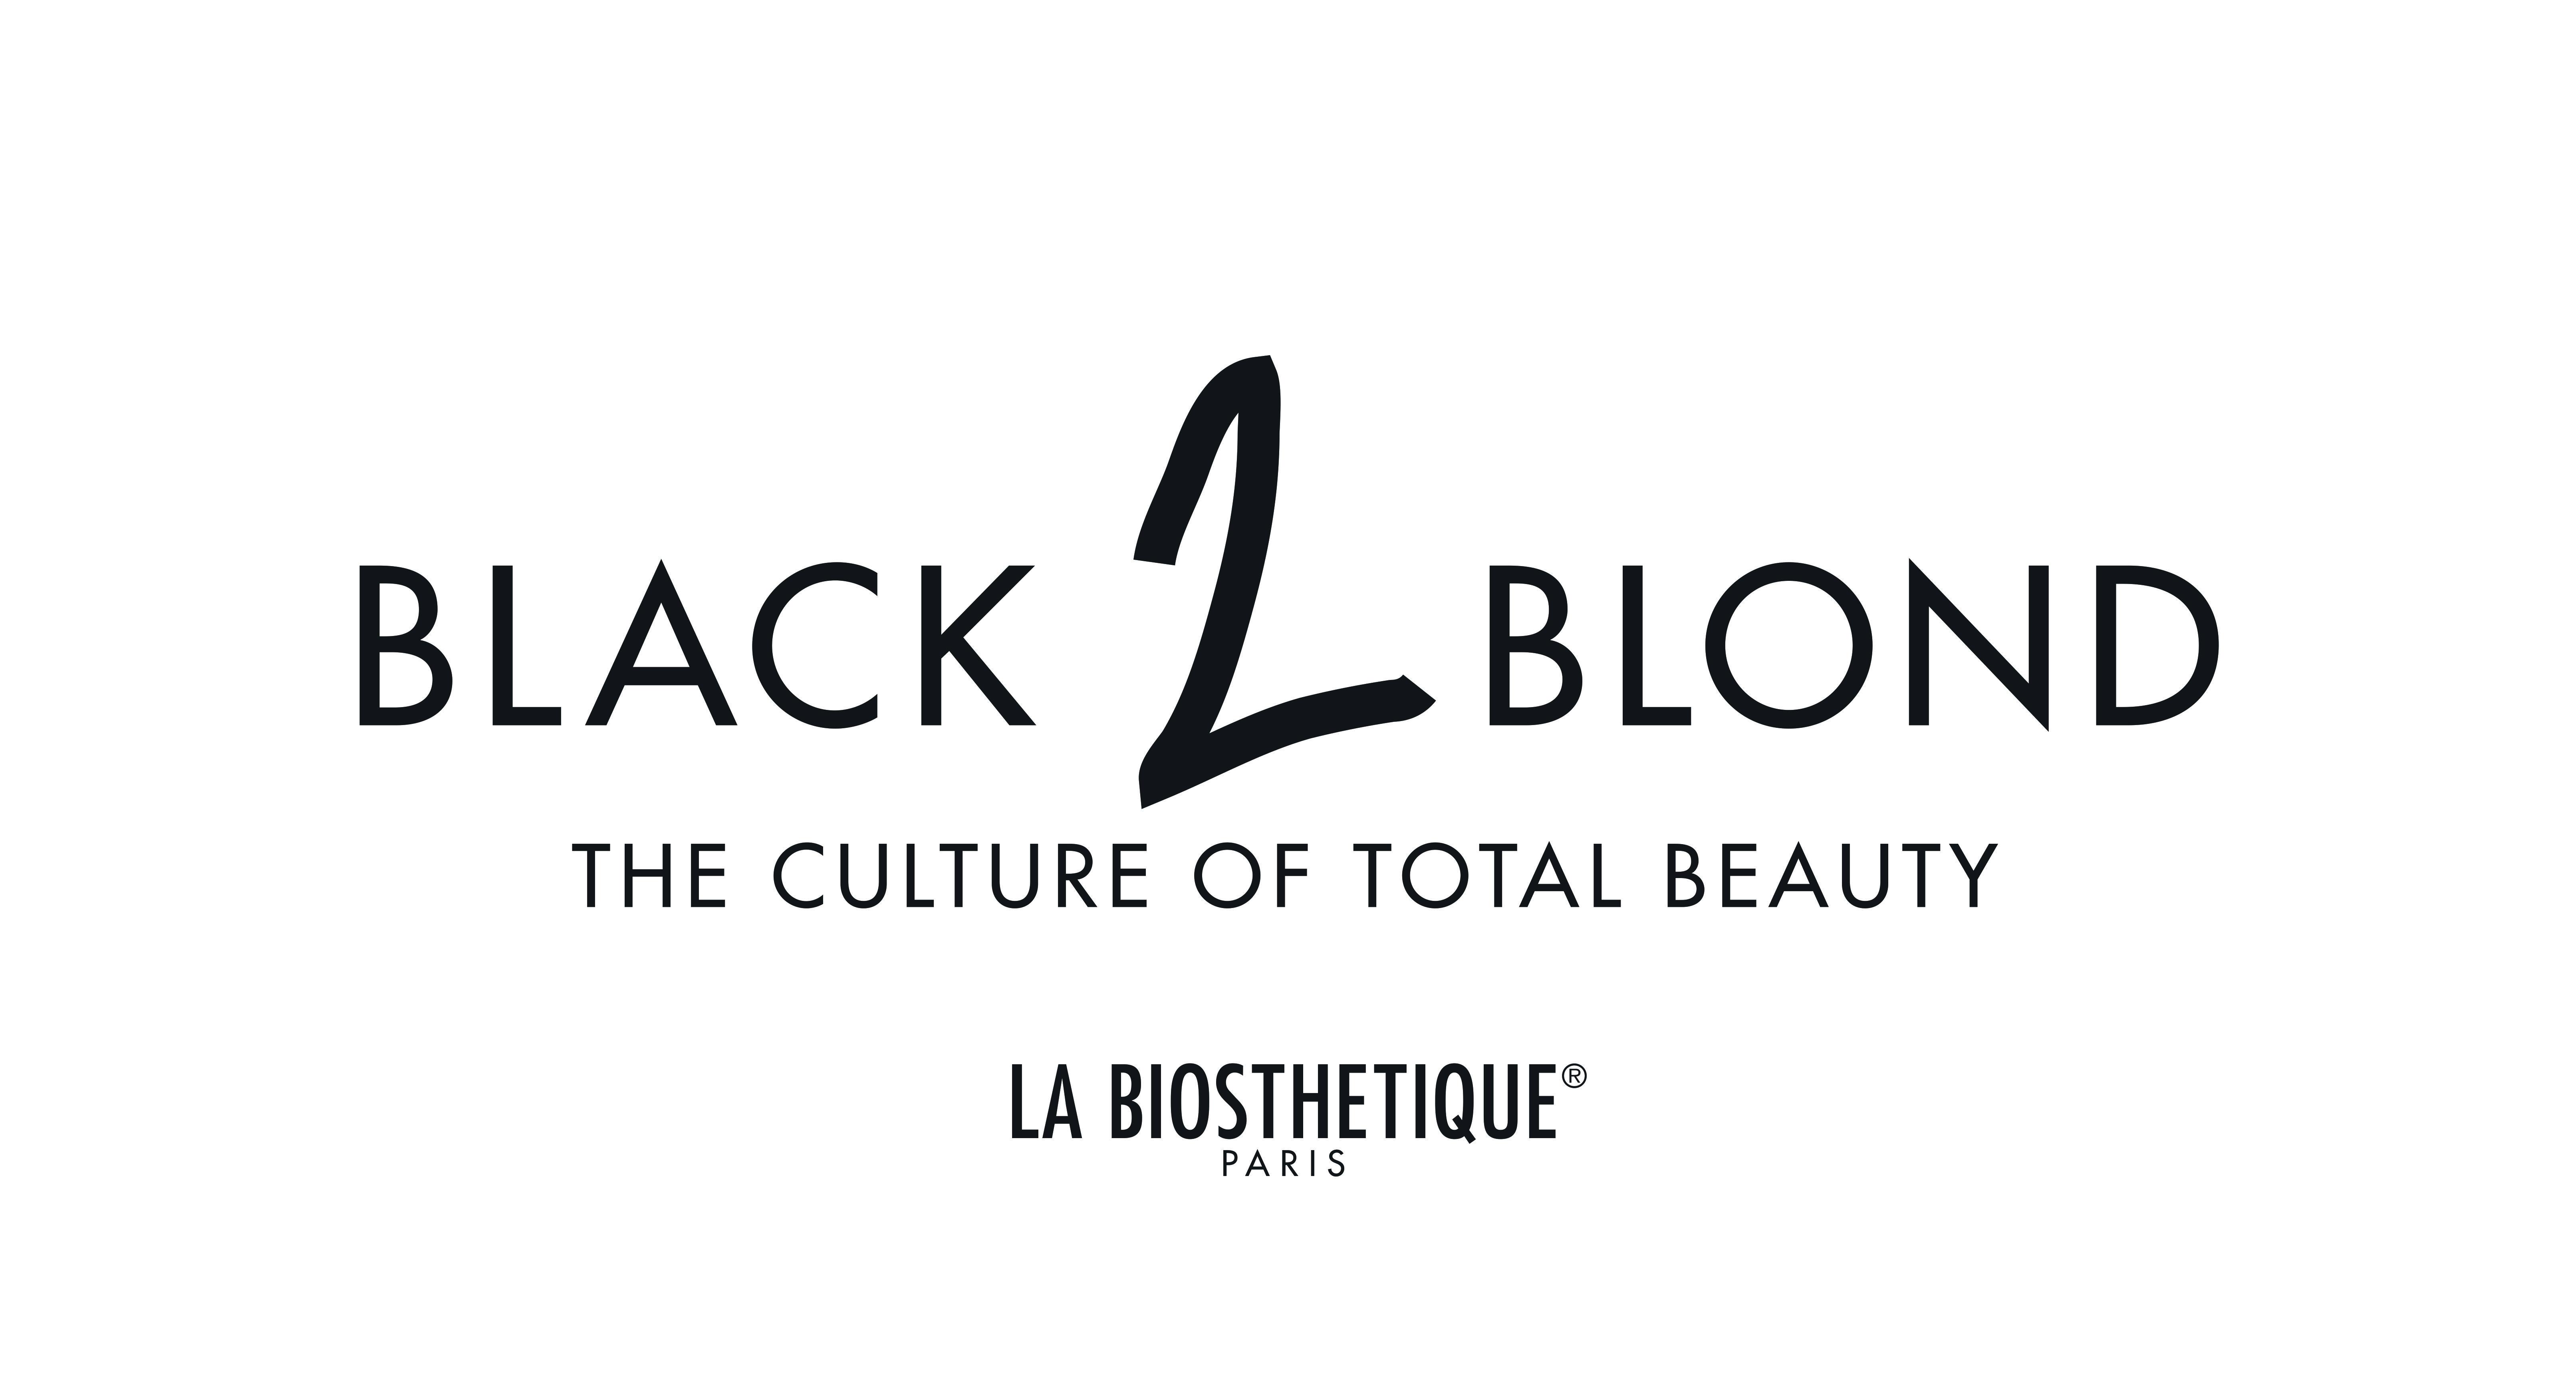 Black 2 Blond